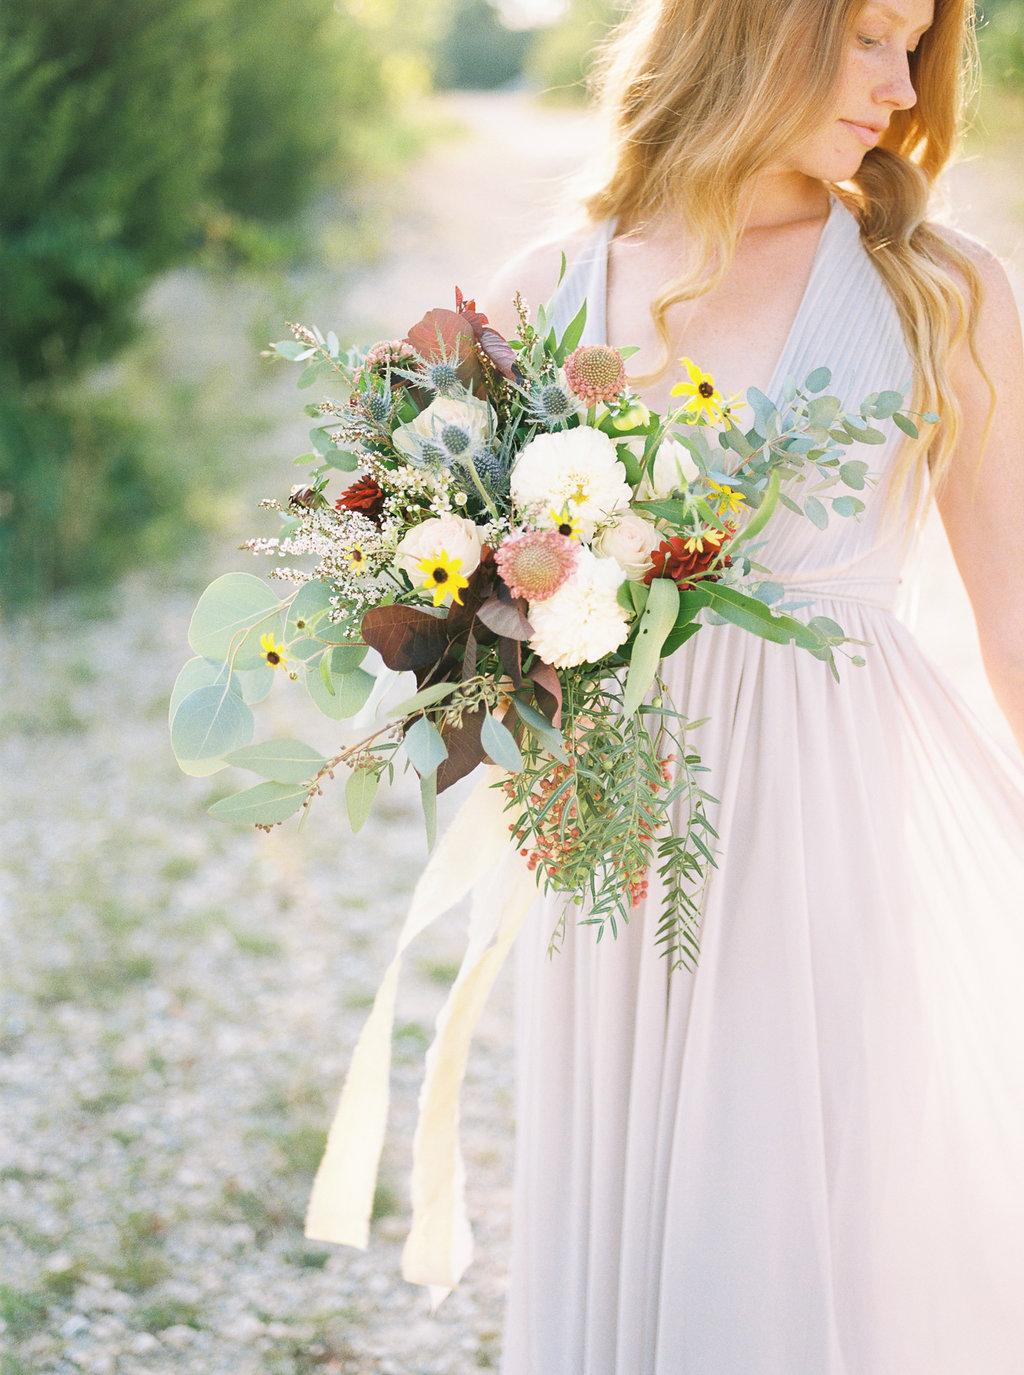 Fine_Art_Film_Wedding_Photographer_Tonya_Espy_Photography-50.jpg